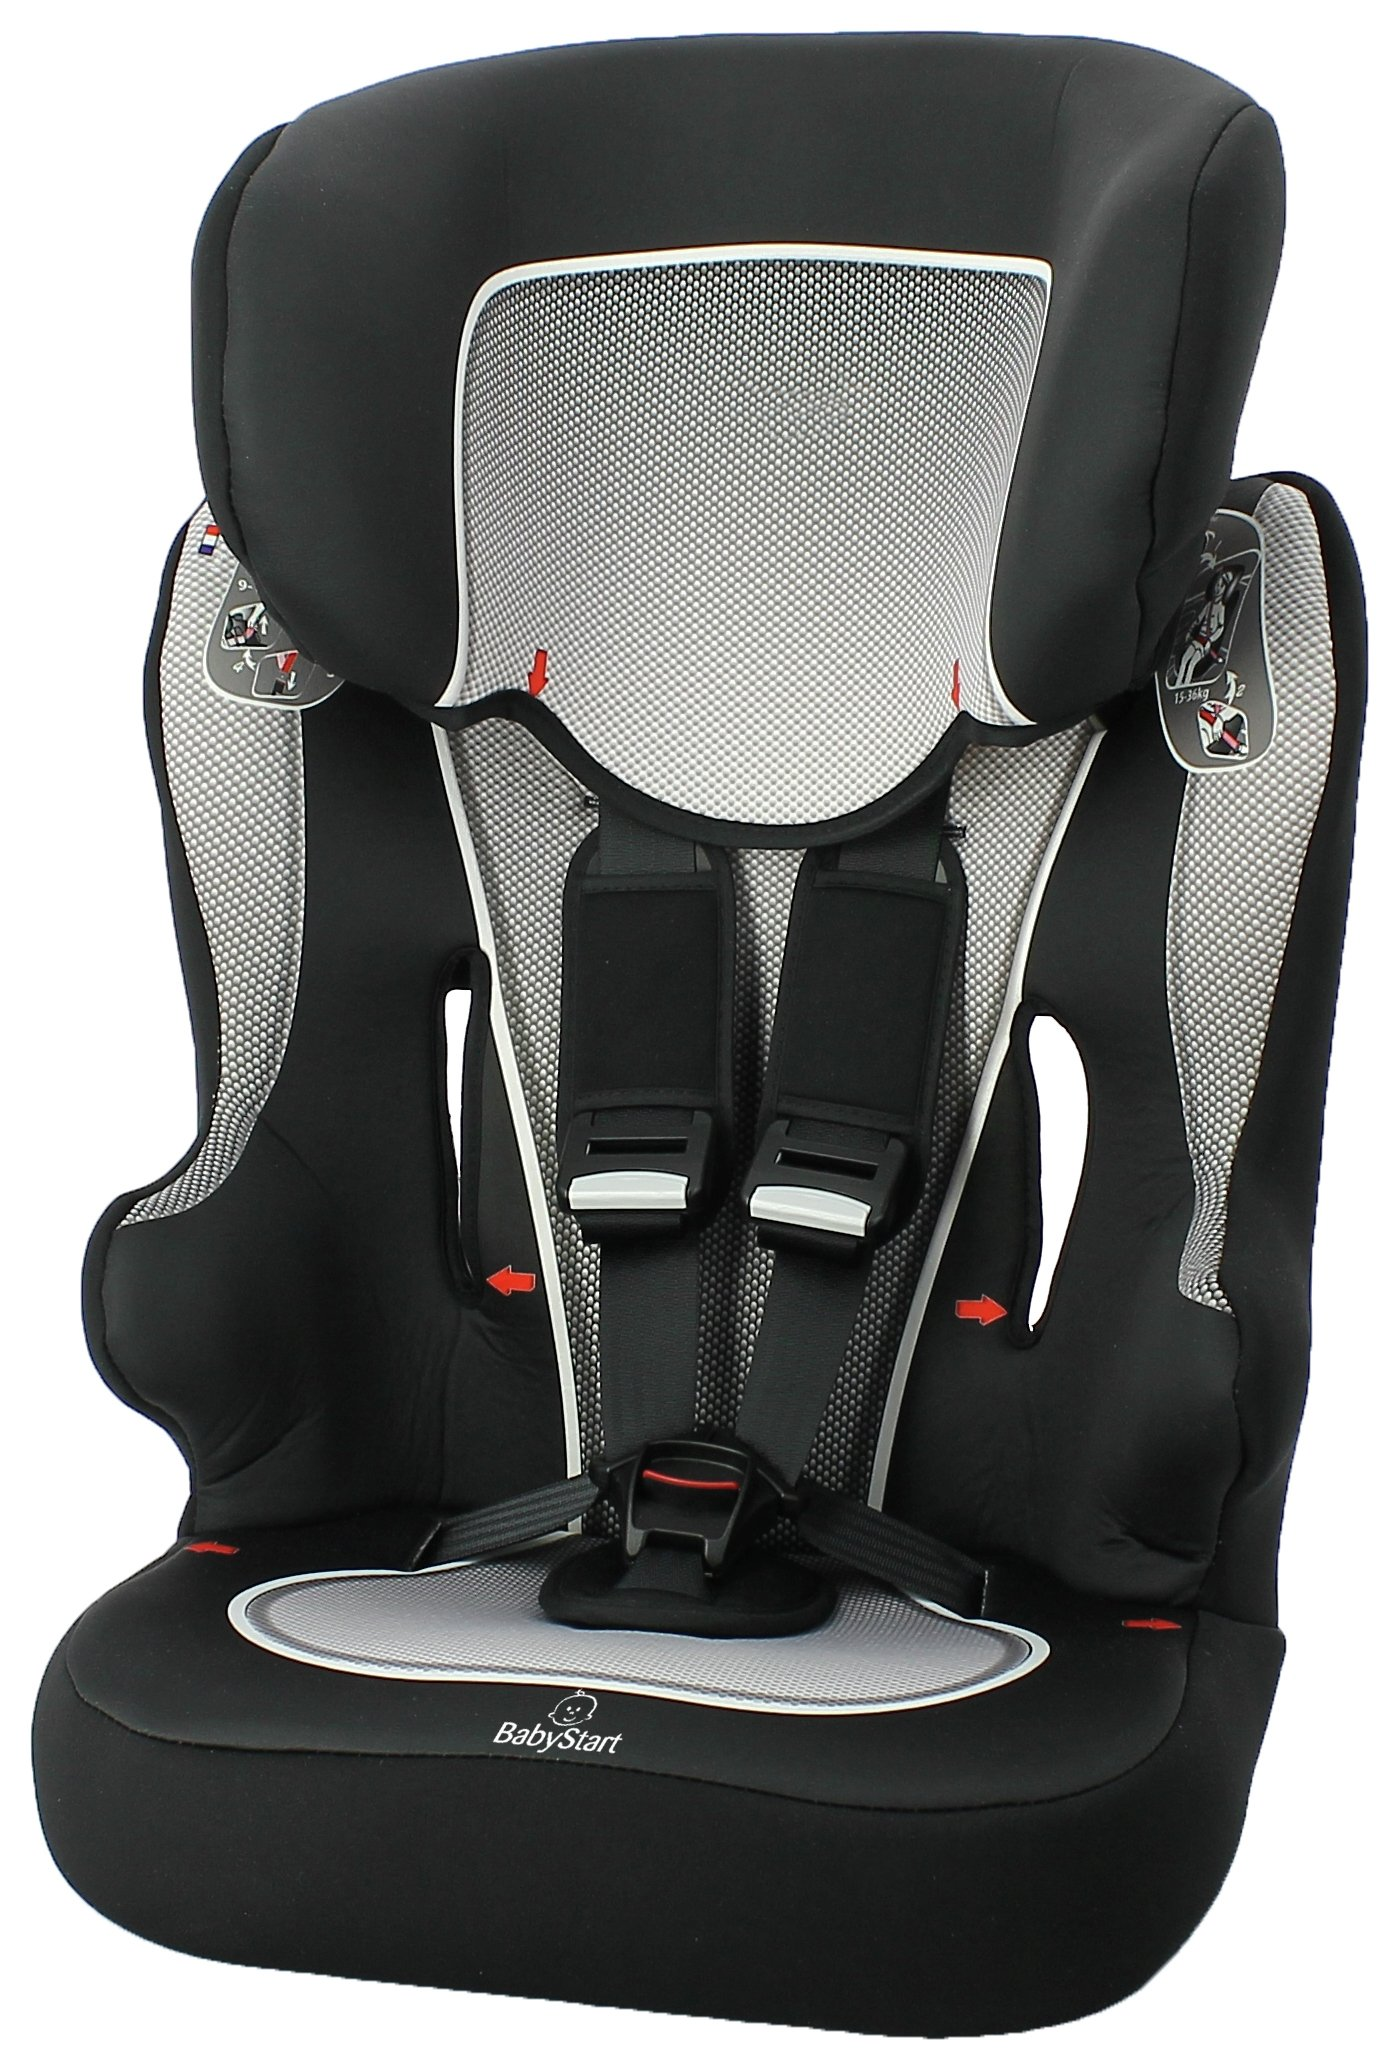 Image of BabyStart - Racer-Group 1-2-3 Black and Grey - Car Seat